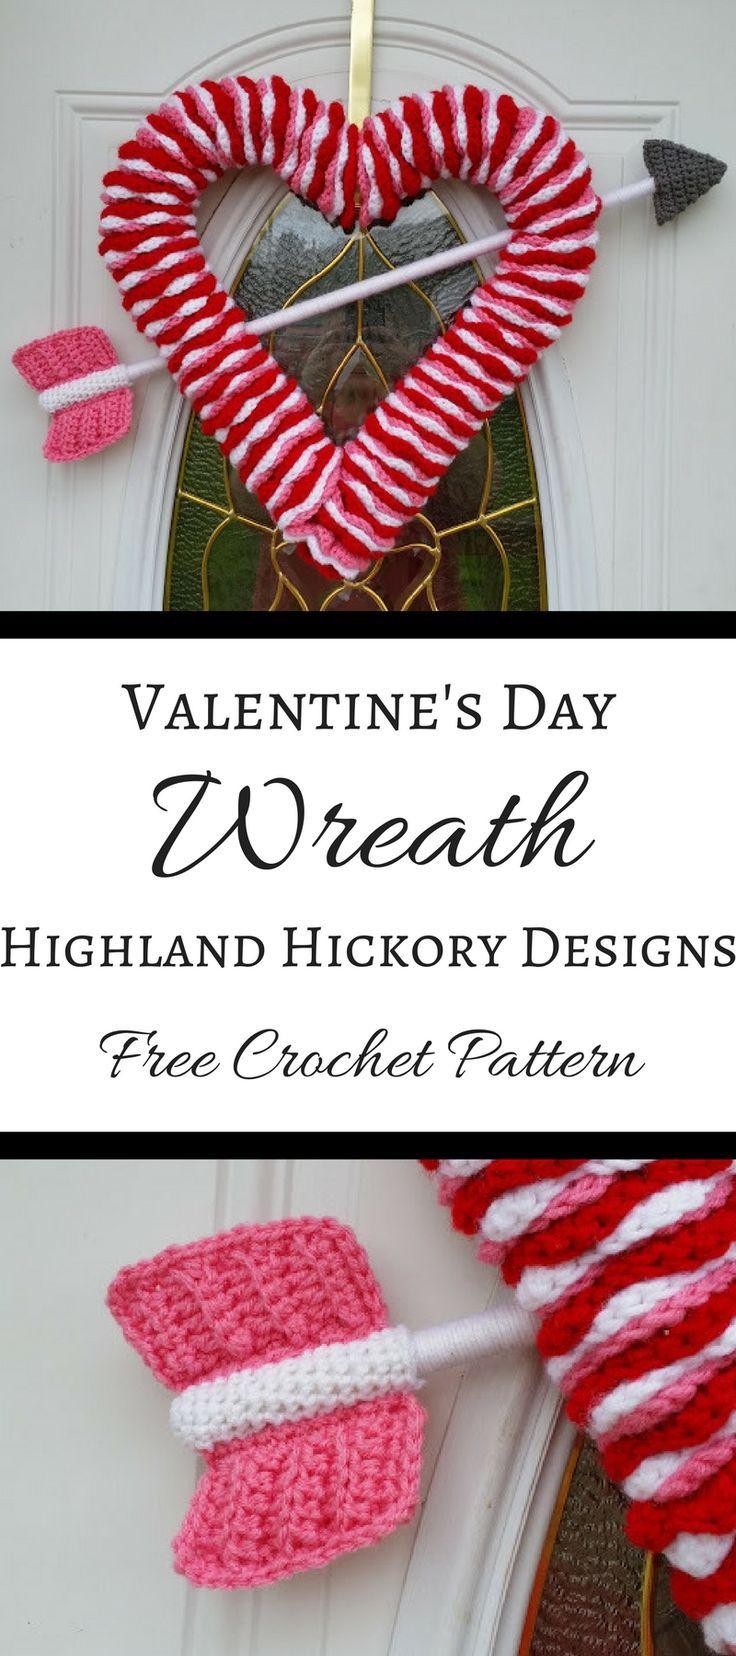 Valentine\'s Day Wreath - Free Crochet Pattern | Pinterest